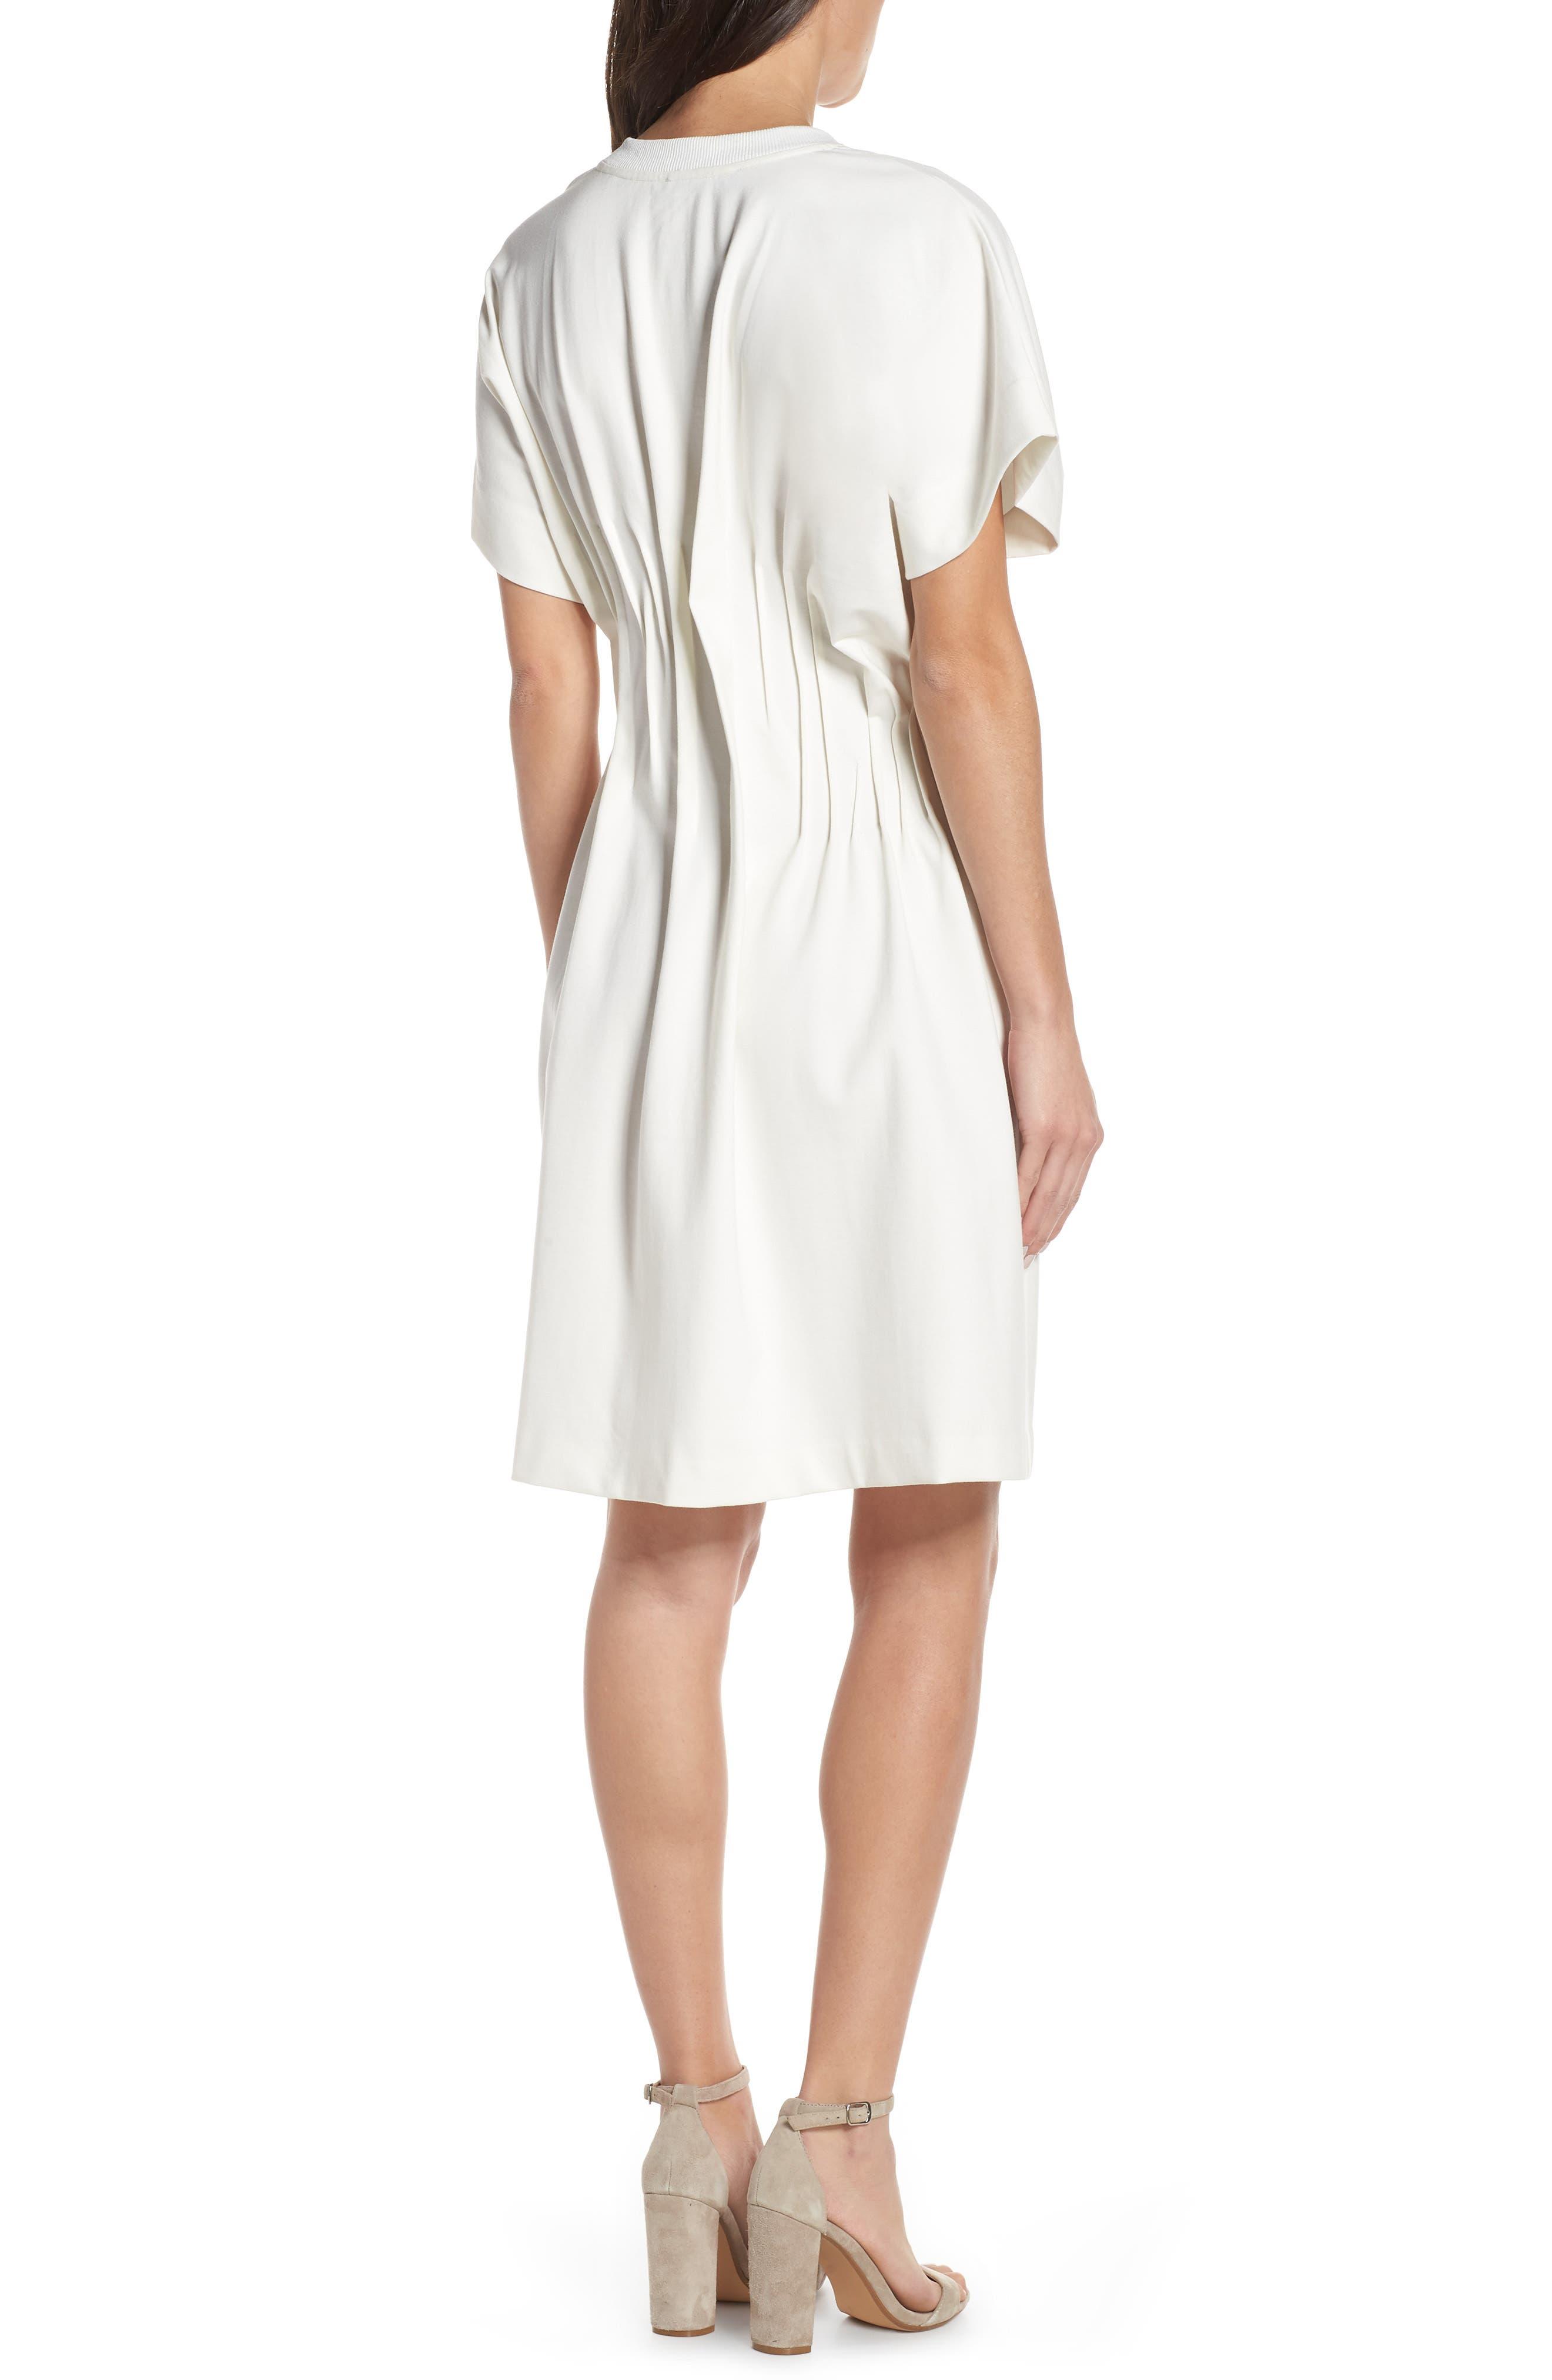 CAARA, Looma T-Shirt Dress, Alternate thumbnail 2, color, WHITE